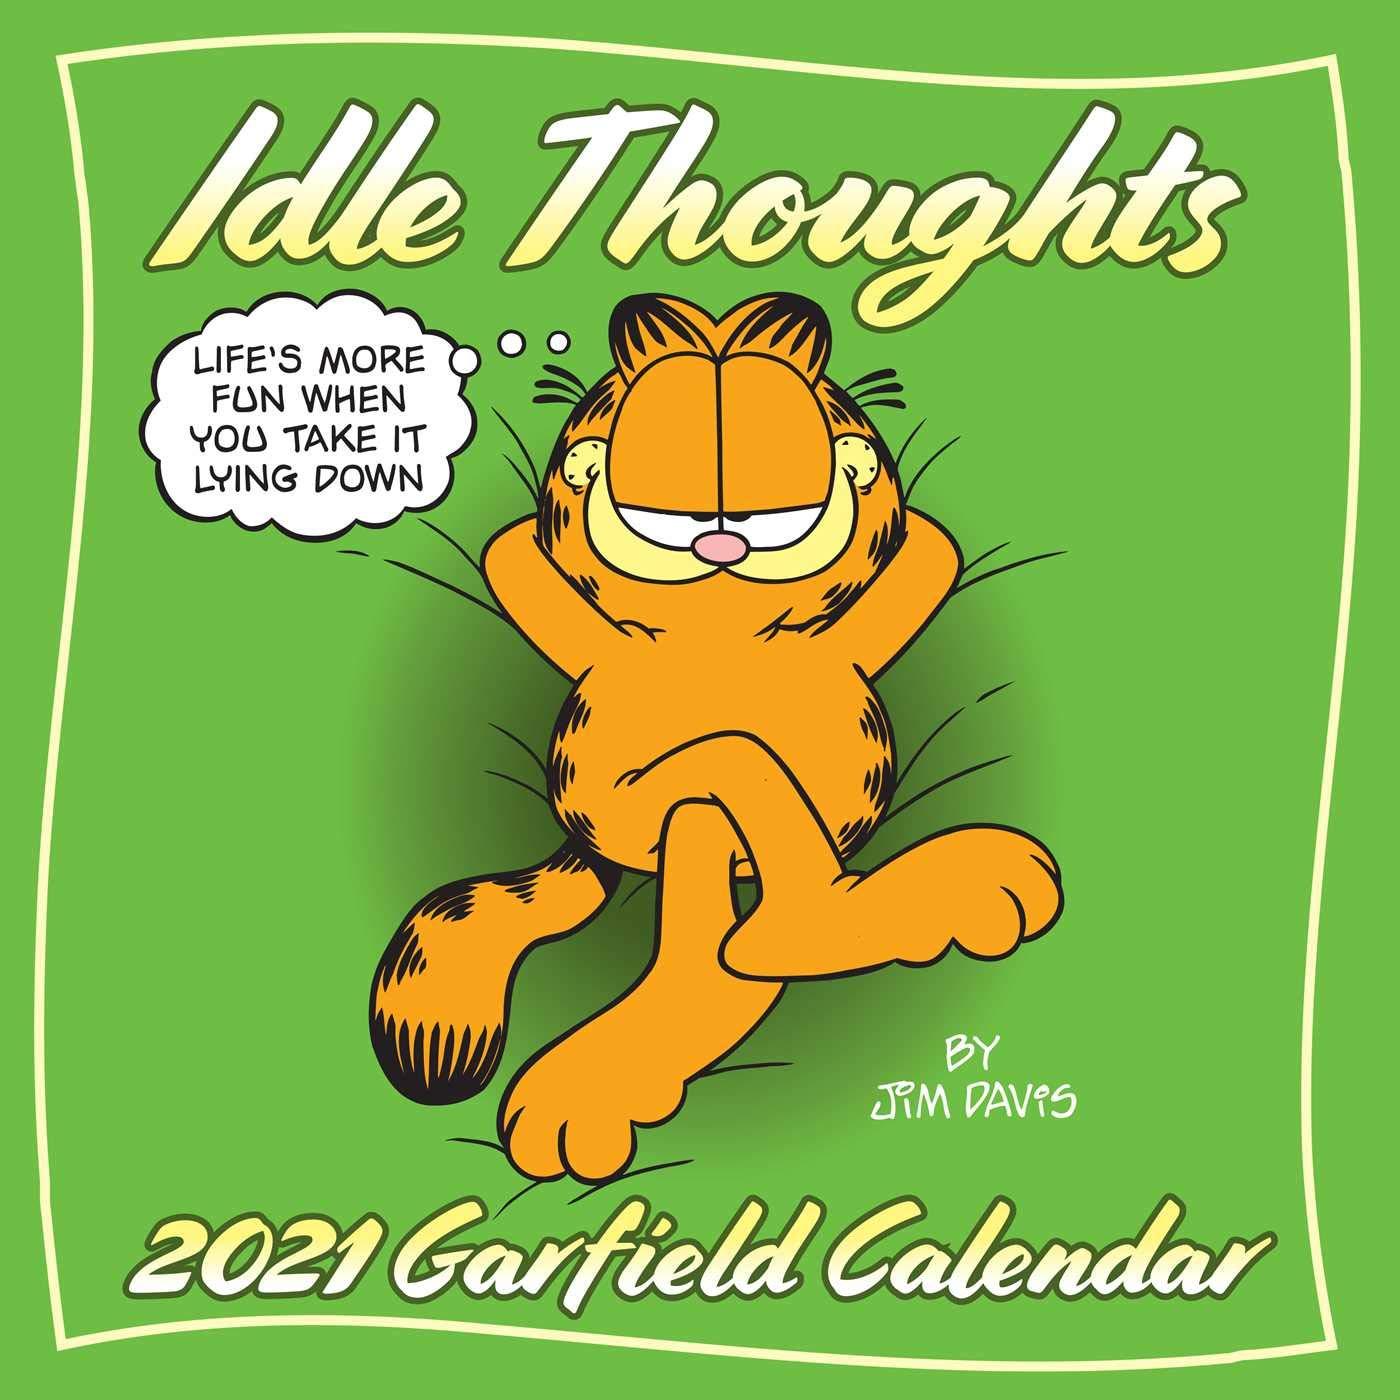 Garfield 2021 Wall Calendar Idle Thoughts Davis Jim 9781524857202 Amazon Com Books